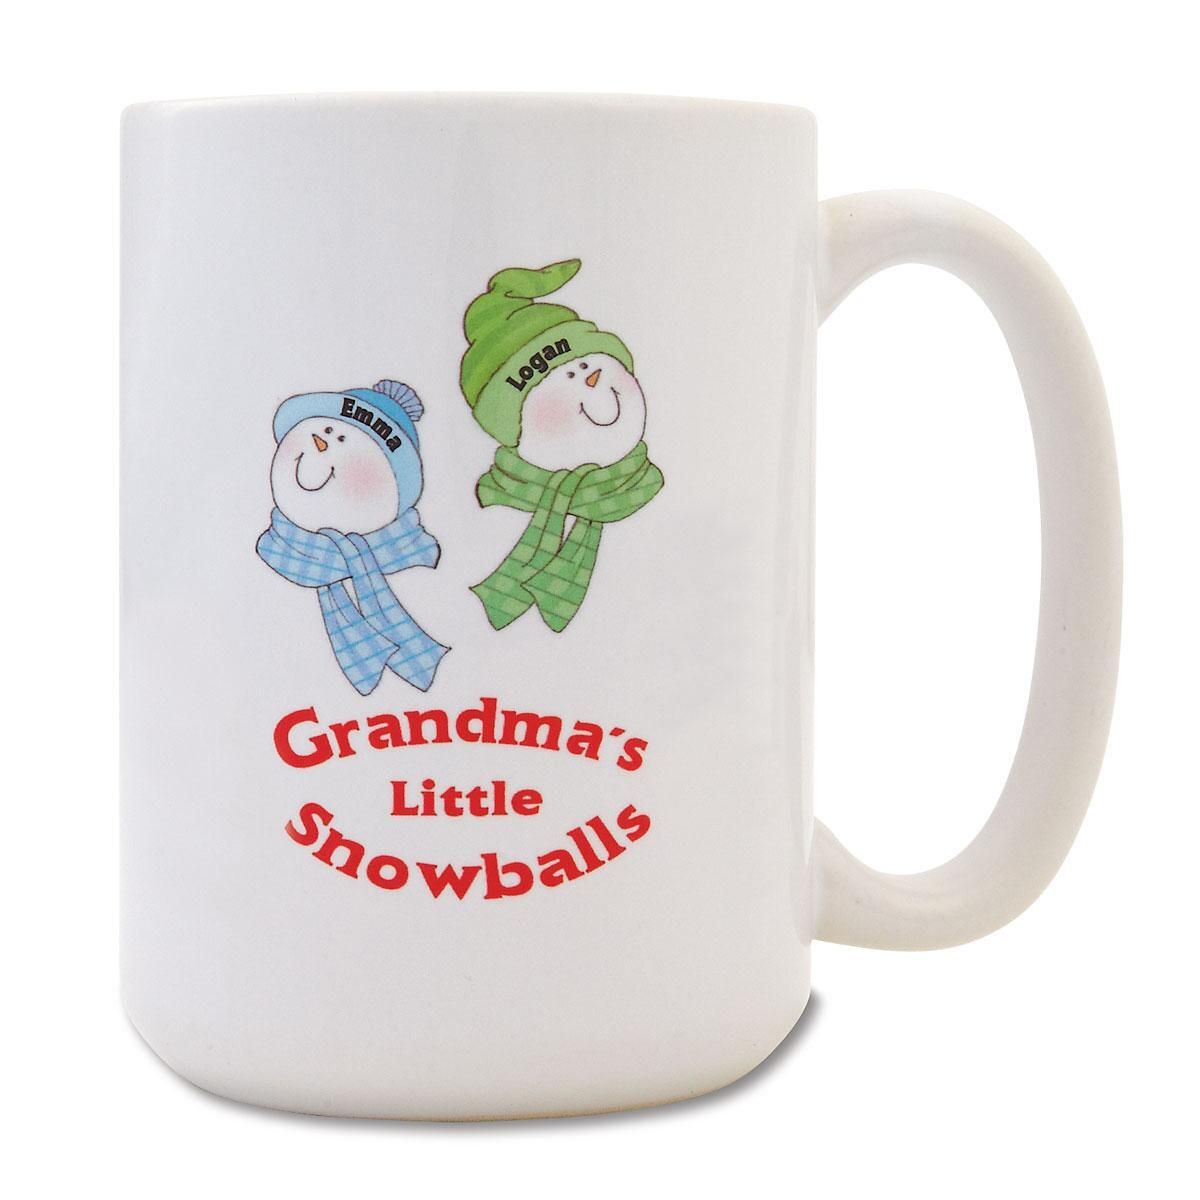 Grandma's Little Snowballs Personalized Mug